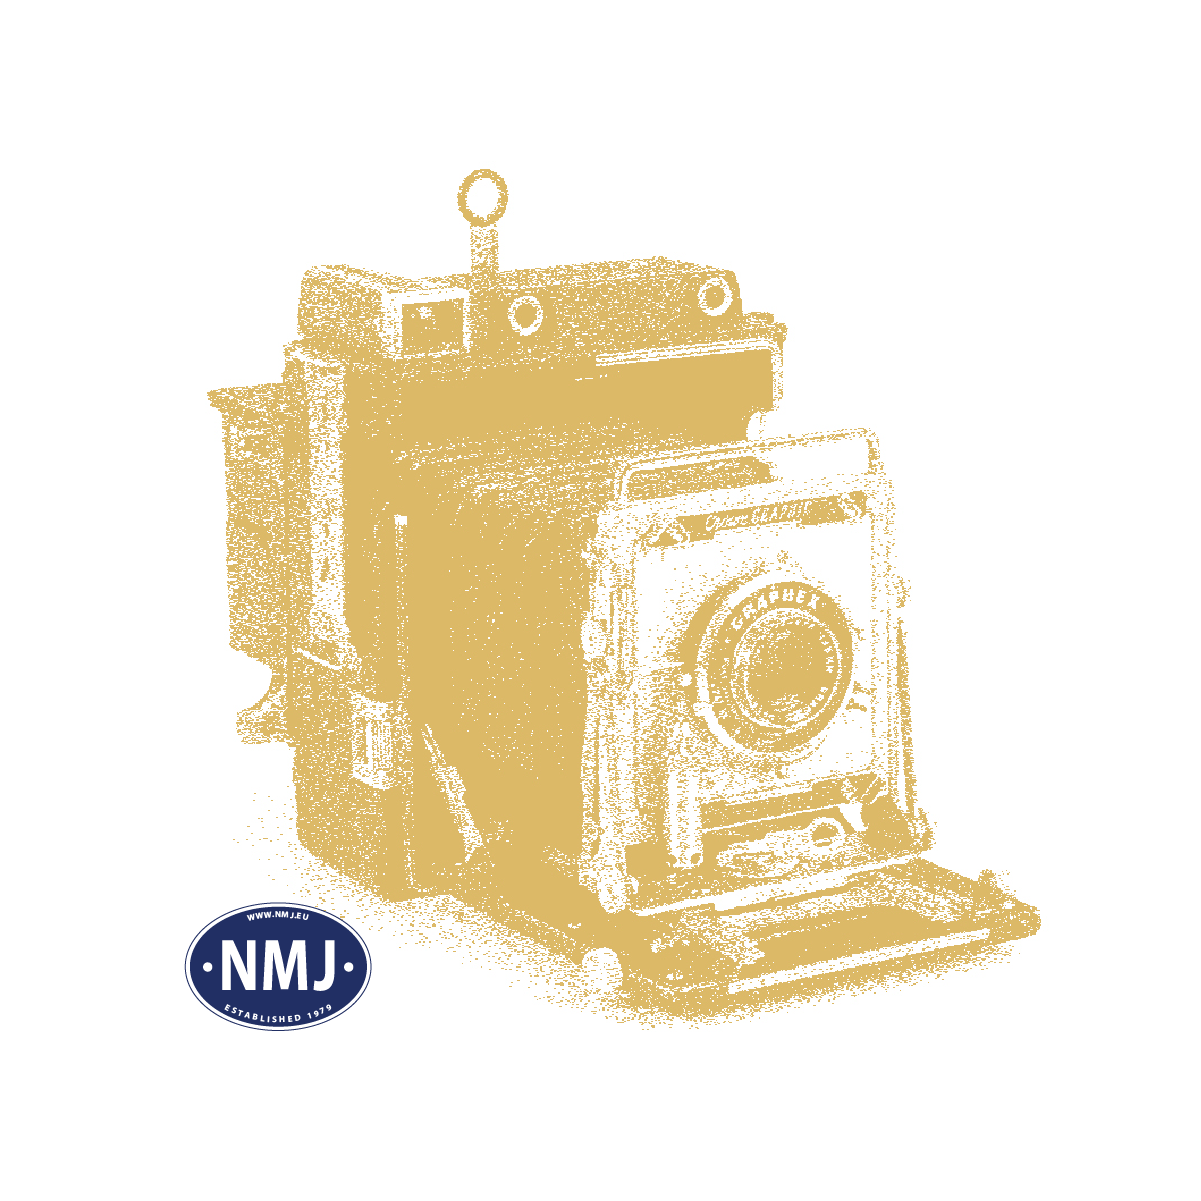 "NMJT90403 - NMJ Topline 5404 ""Nohab"" Diesellok der SNCB, DC"